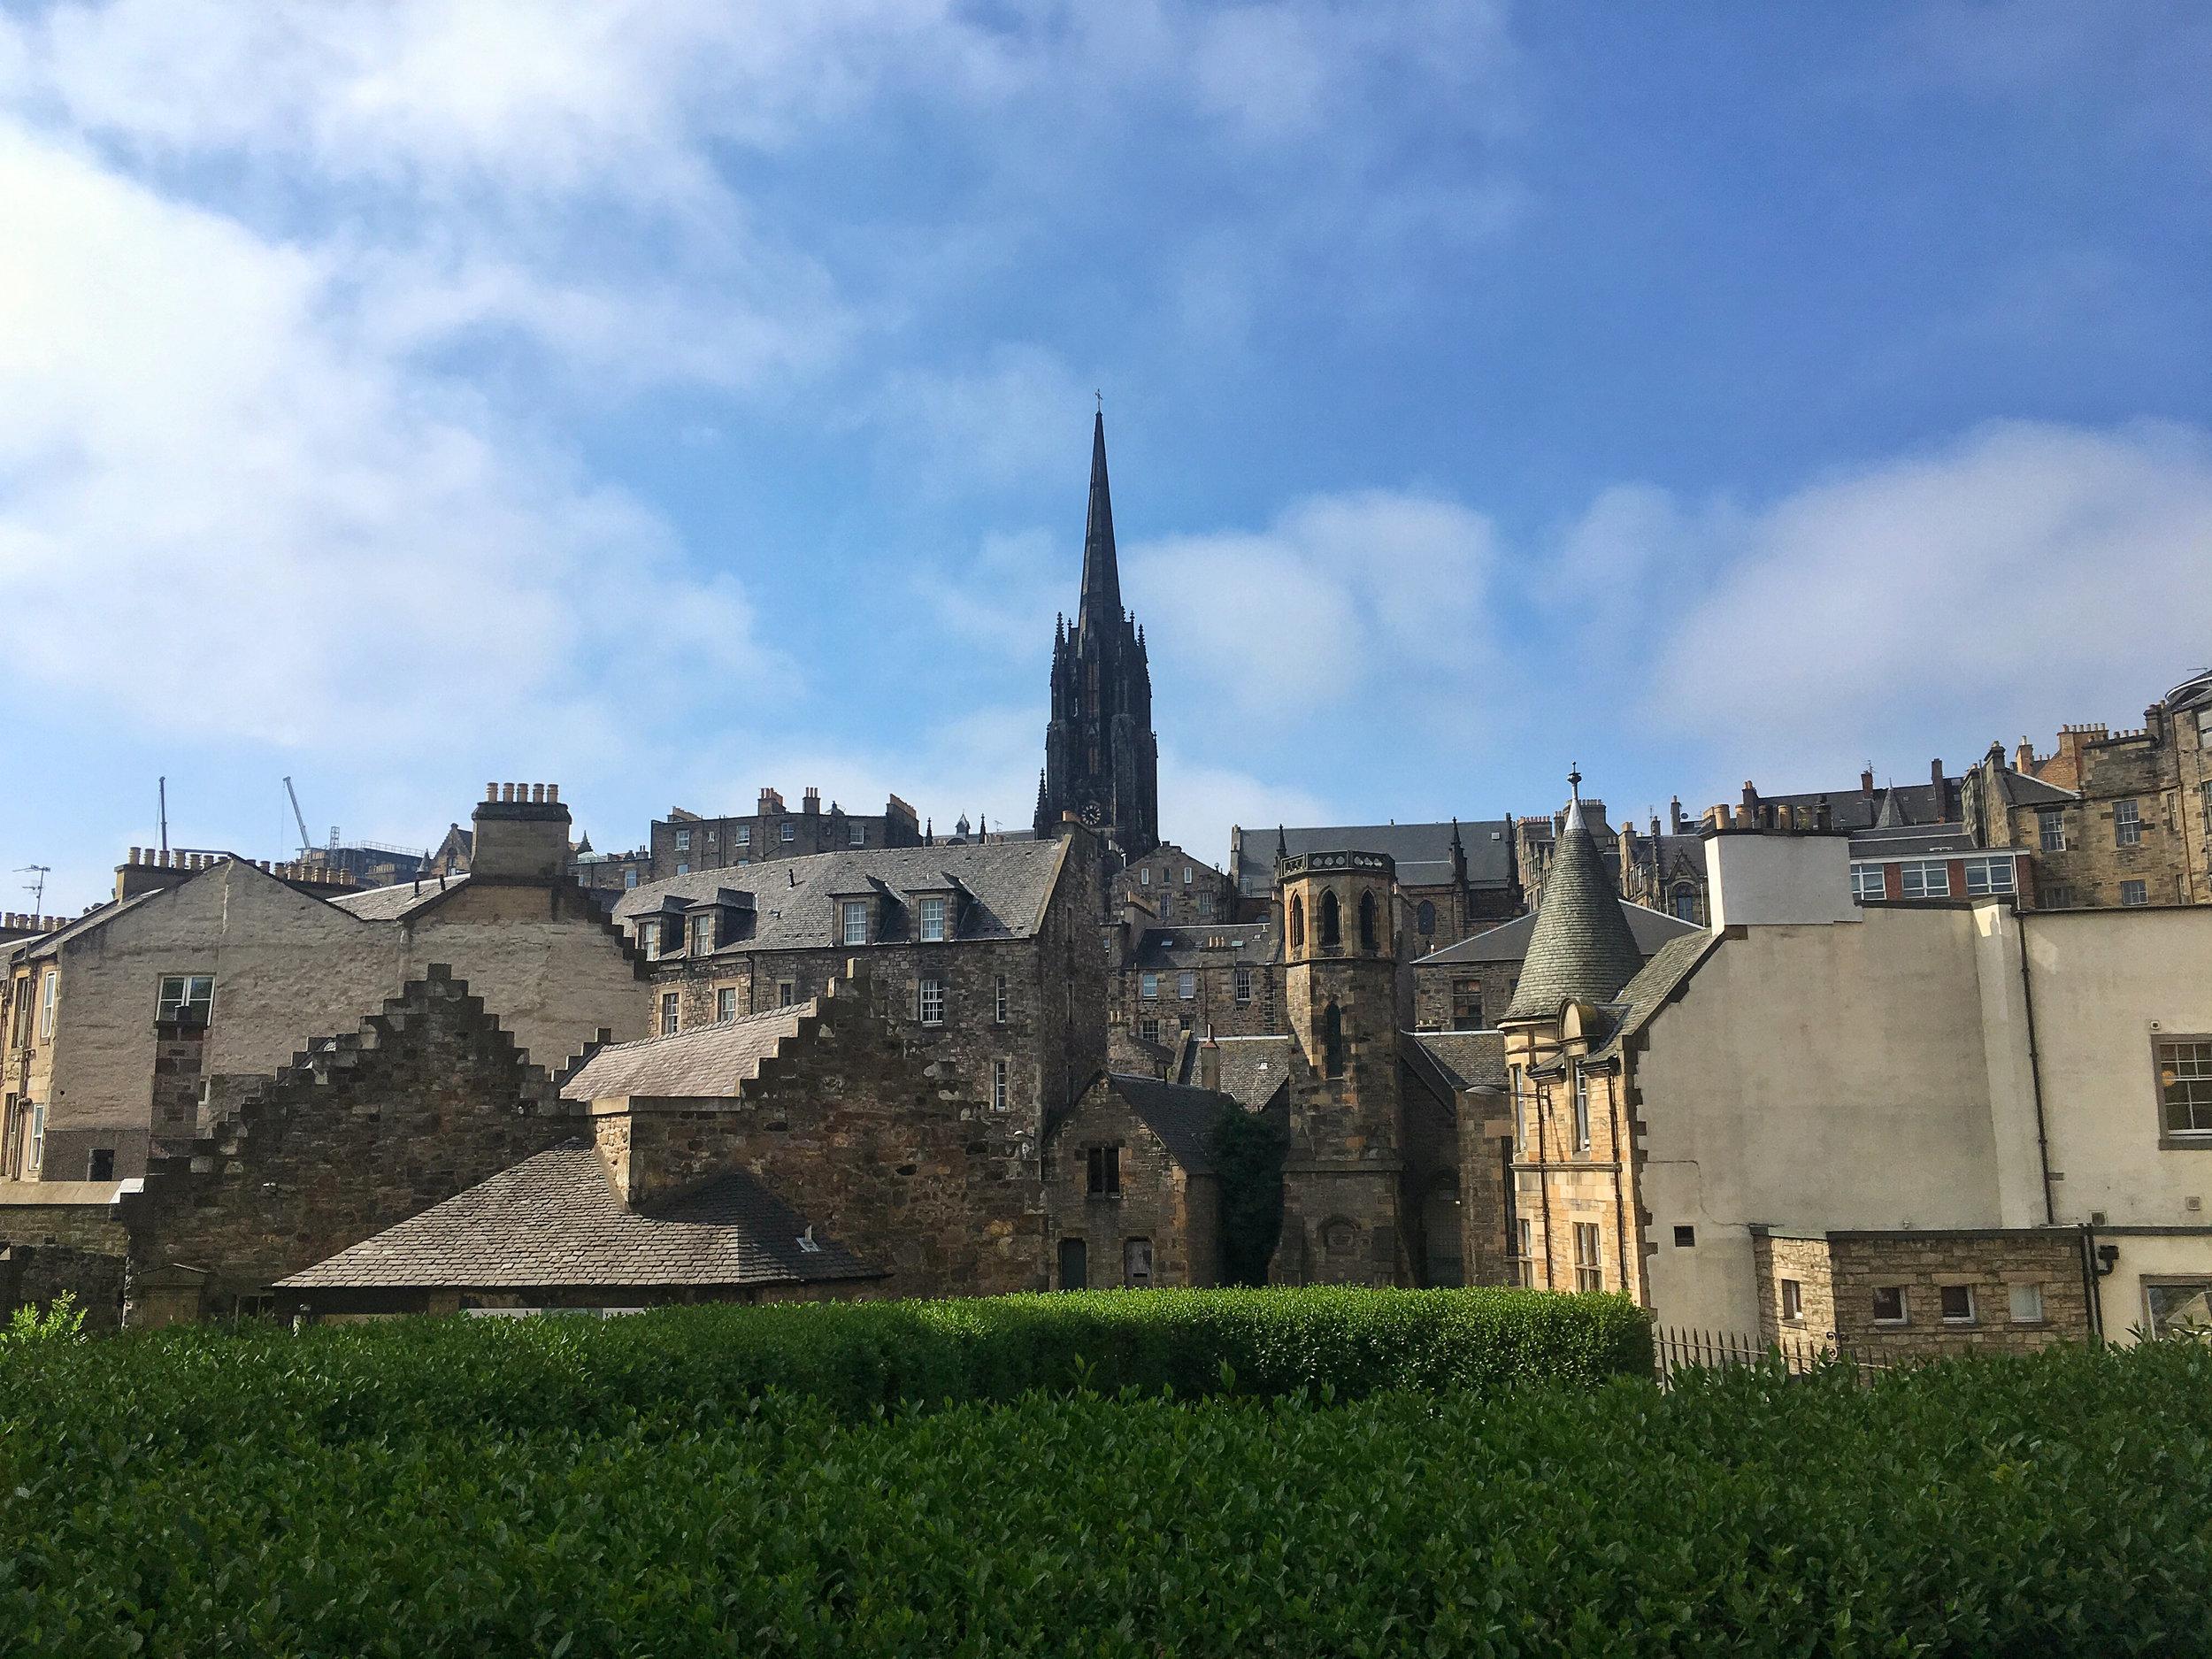 Edinburgh: Home of Fringe Fest, J.K. Rolling, and Buckfast Tonic Wine